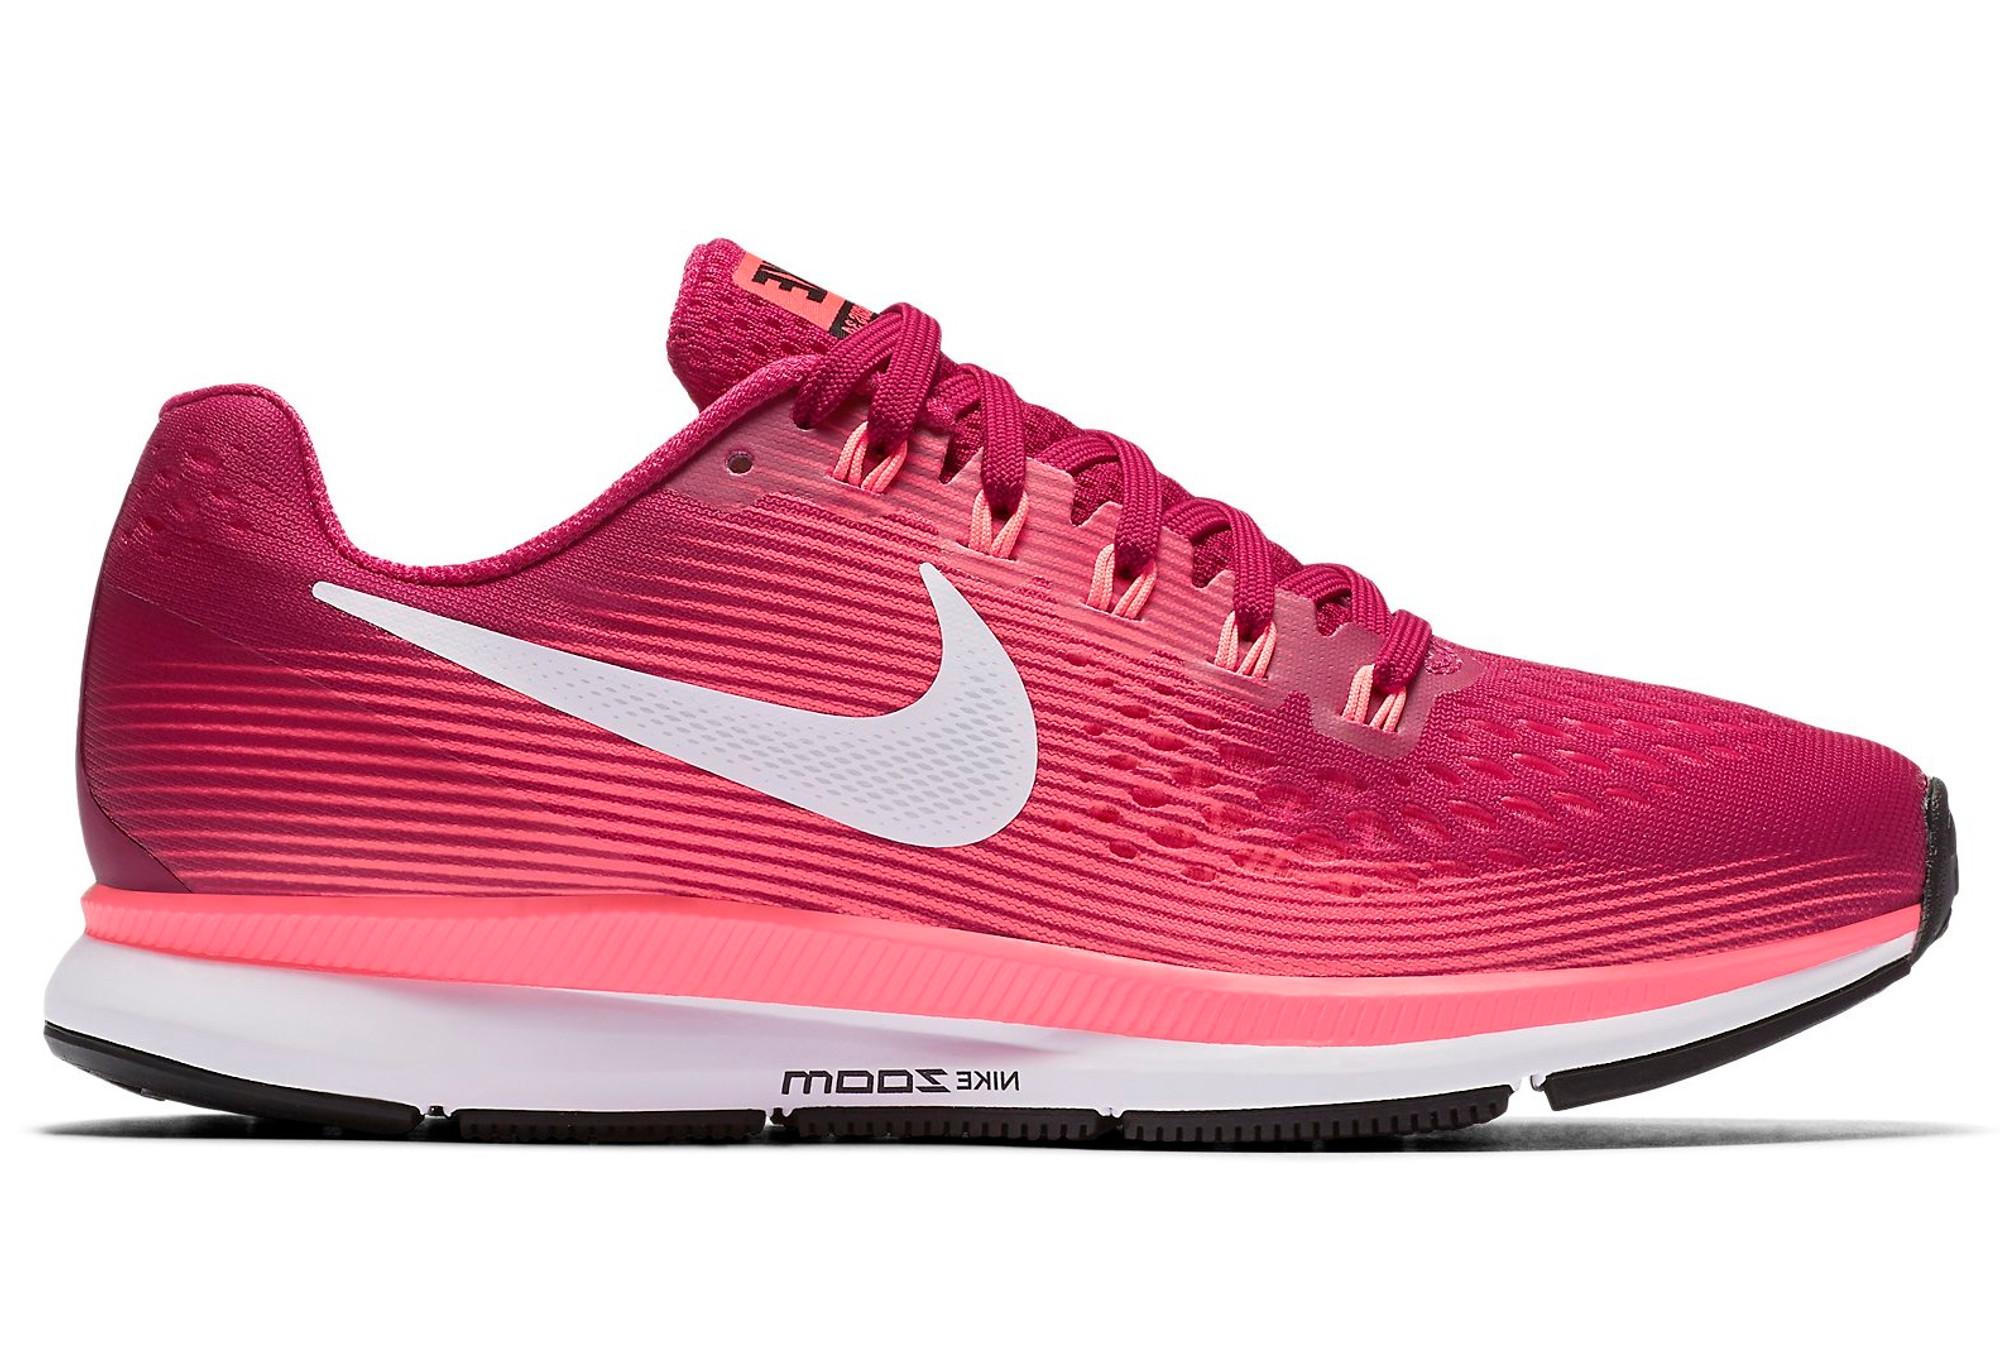 nike air zoom pegasus 34 shoes pink women. Black Bedroom Furniture Sets. Home Design Ideas